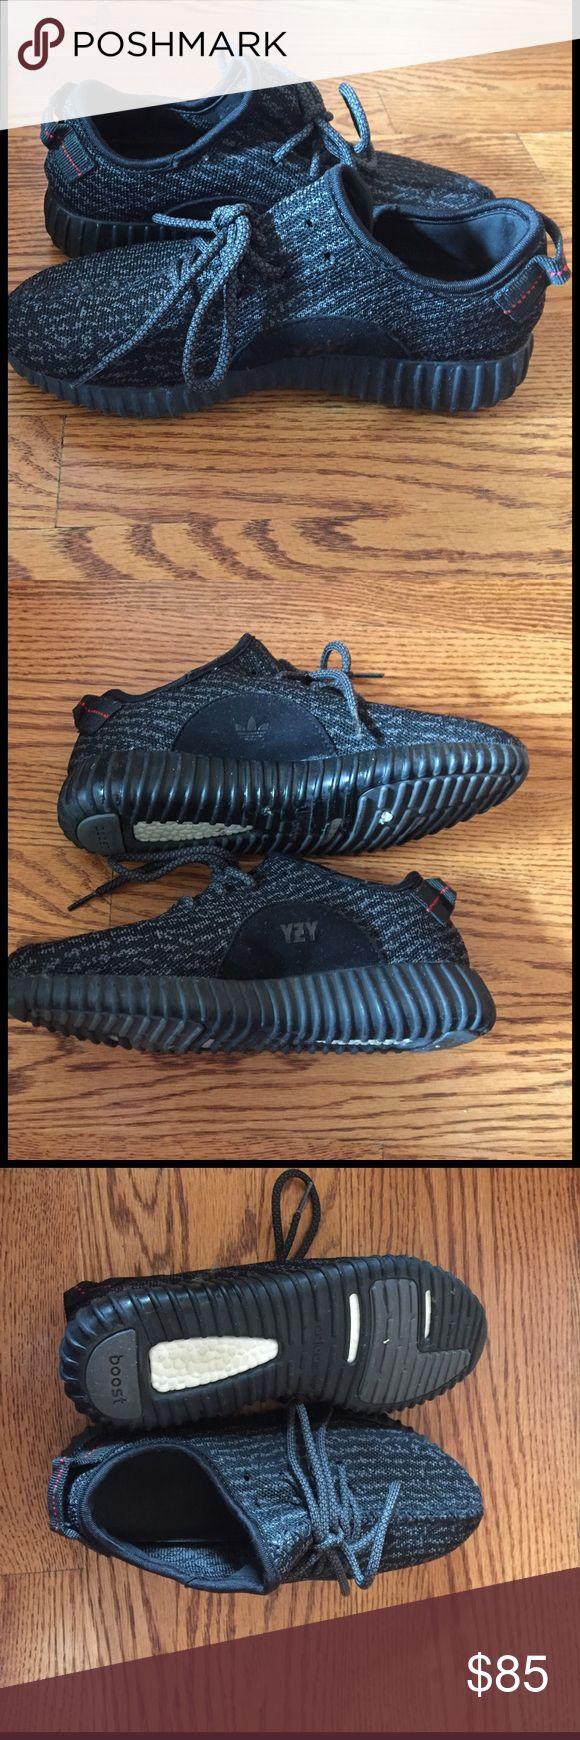 Fake yeezy boost in pirate black women's/men's 7 FAKE** yeezy boost pirate black Yeezy Shoes Sneakers